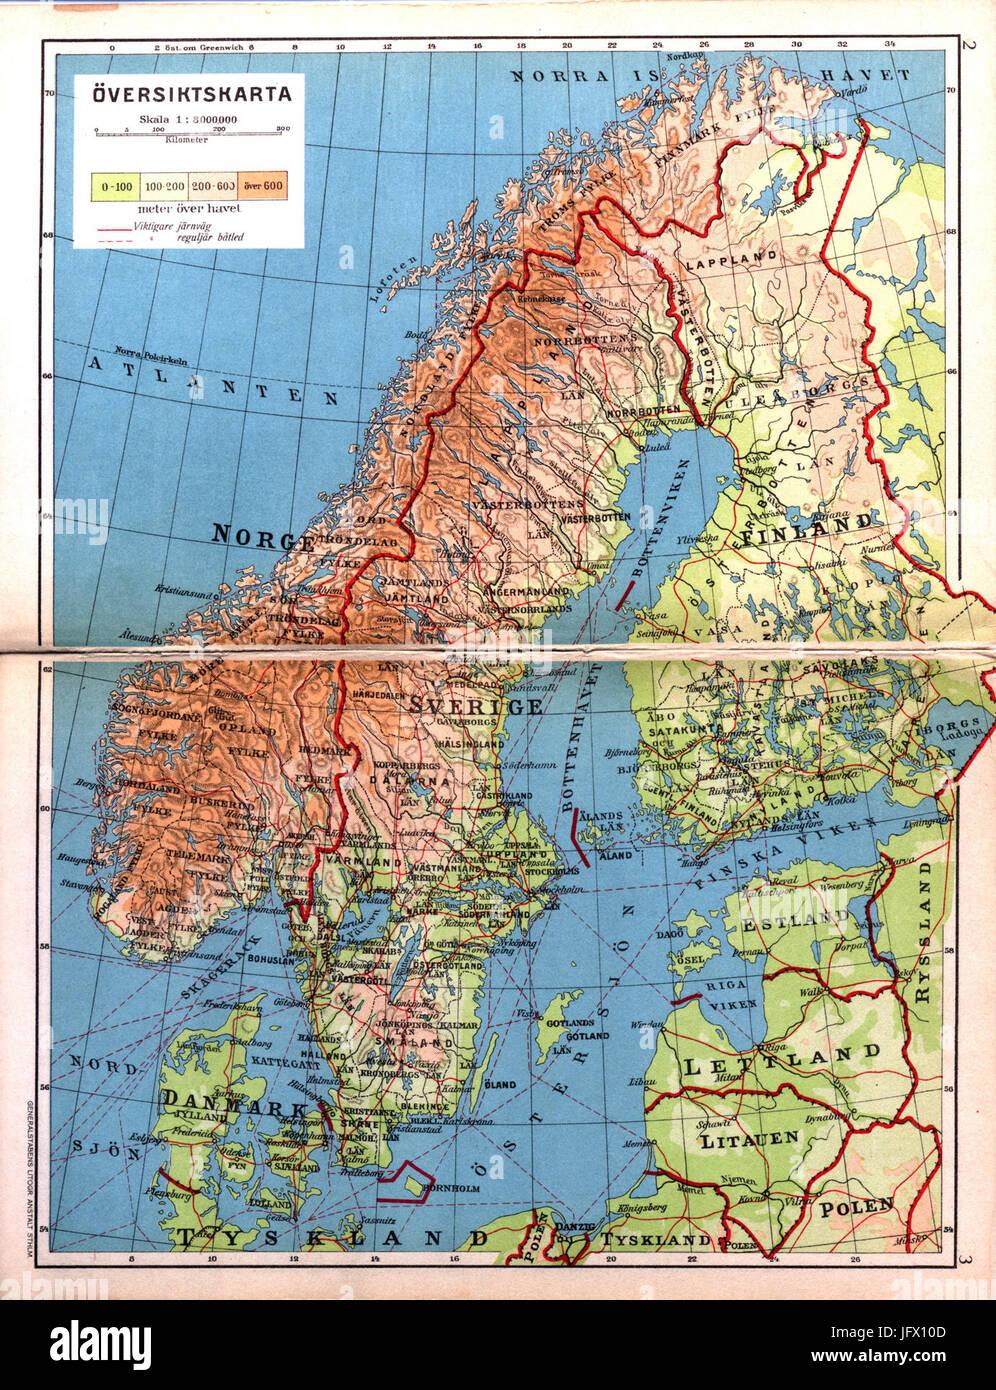 Cohrs Atlas Over Sverige 0002 Oversiktskarta Stock Photo